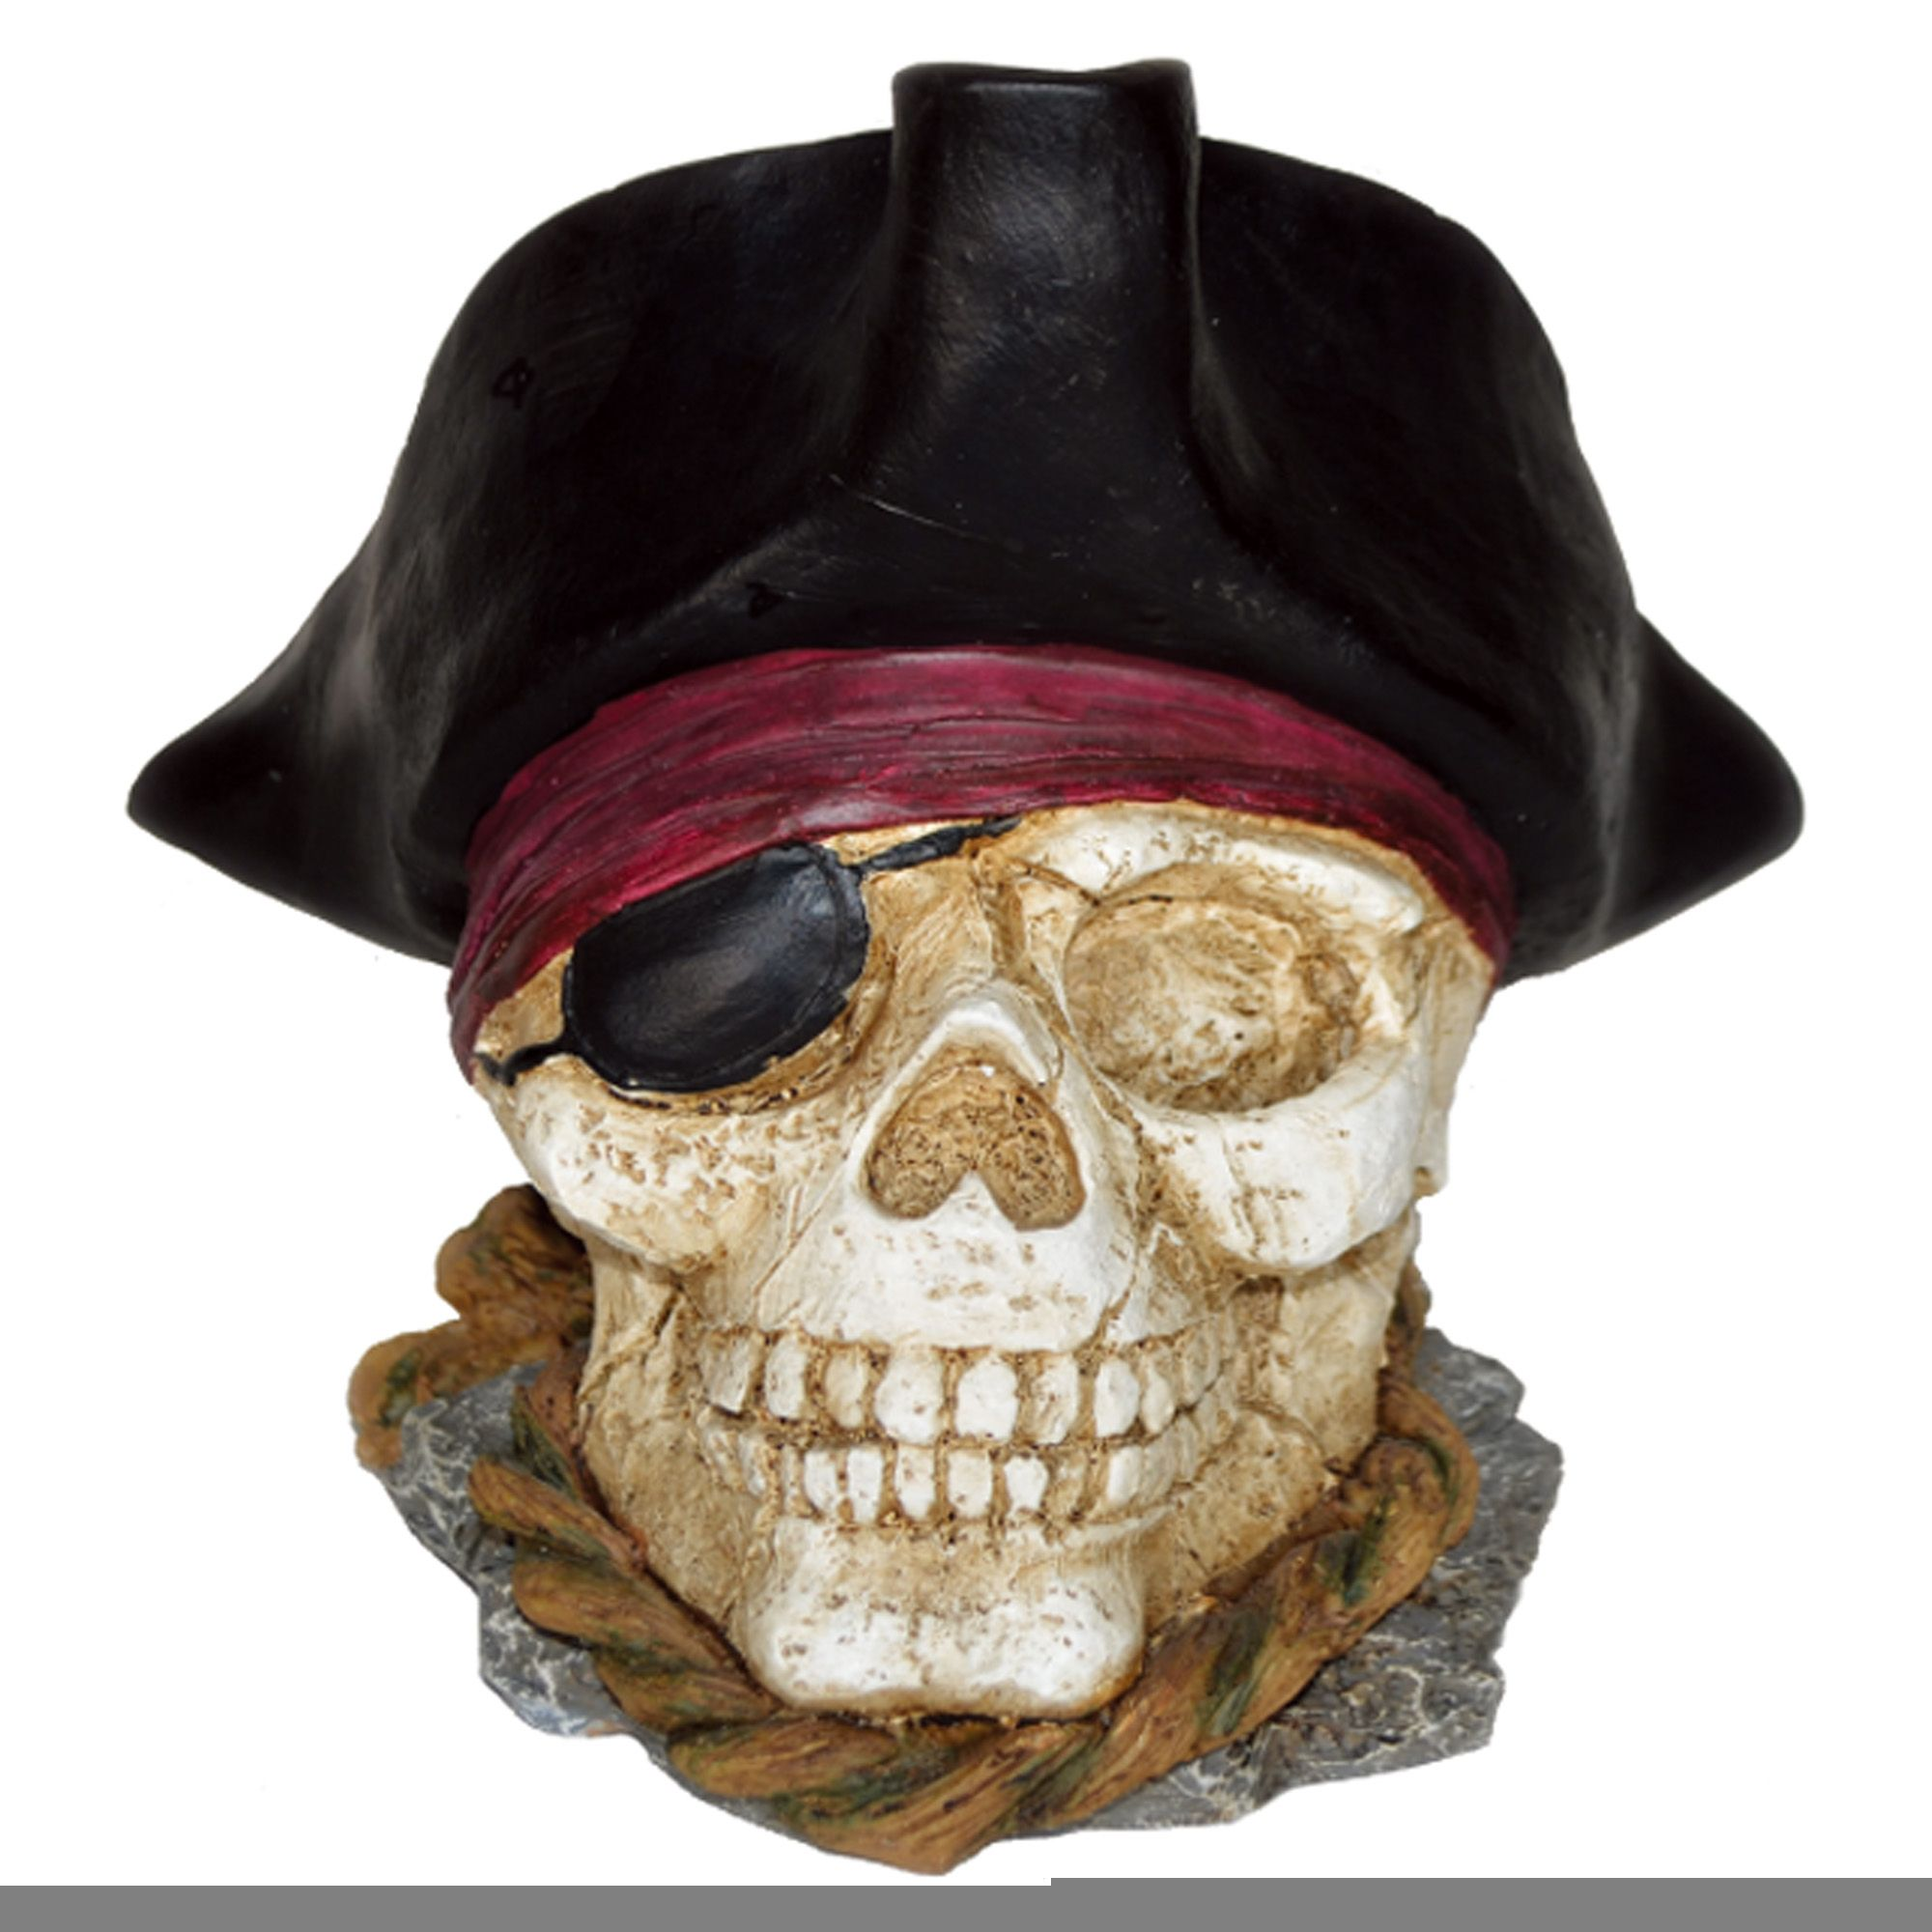 24adb4c1ac1 Homestyles - Life's A Beach - Pirate Skull Nautical, Coastal, Pool ...